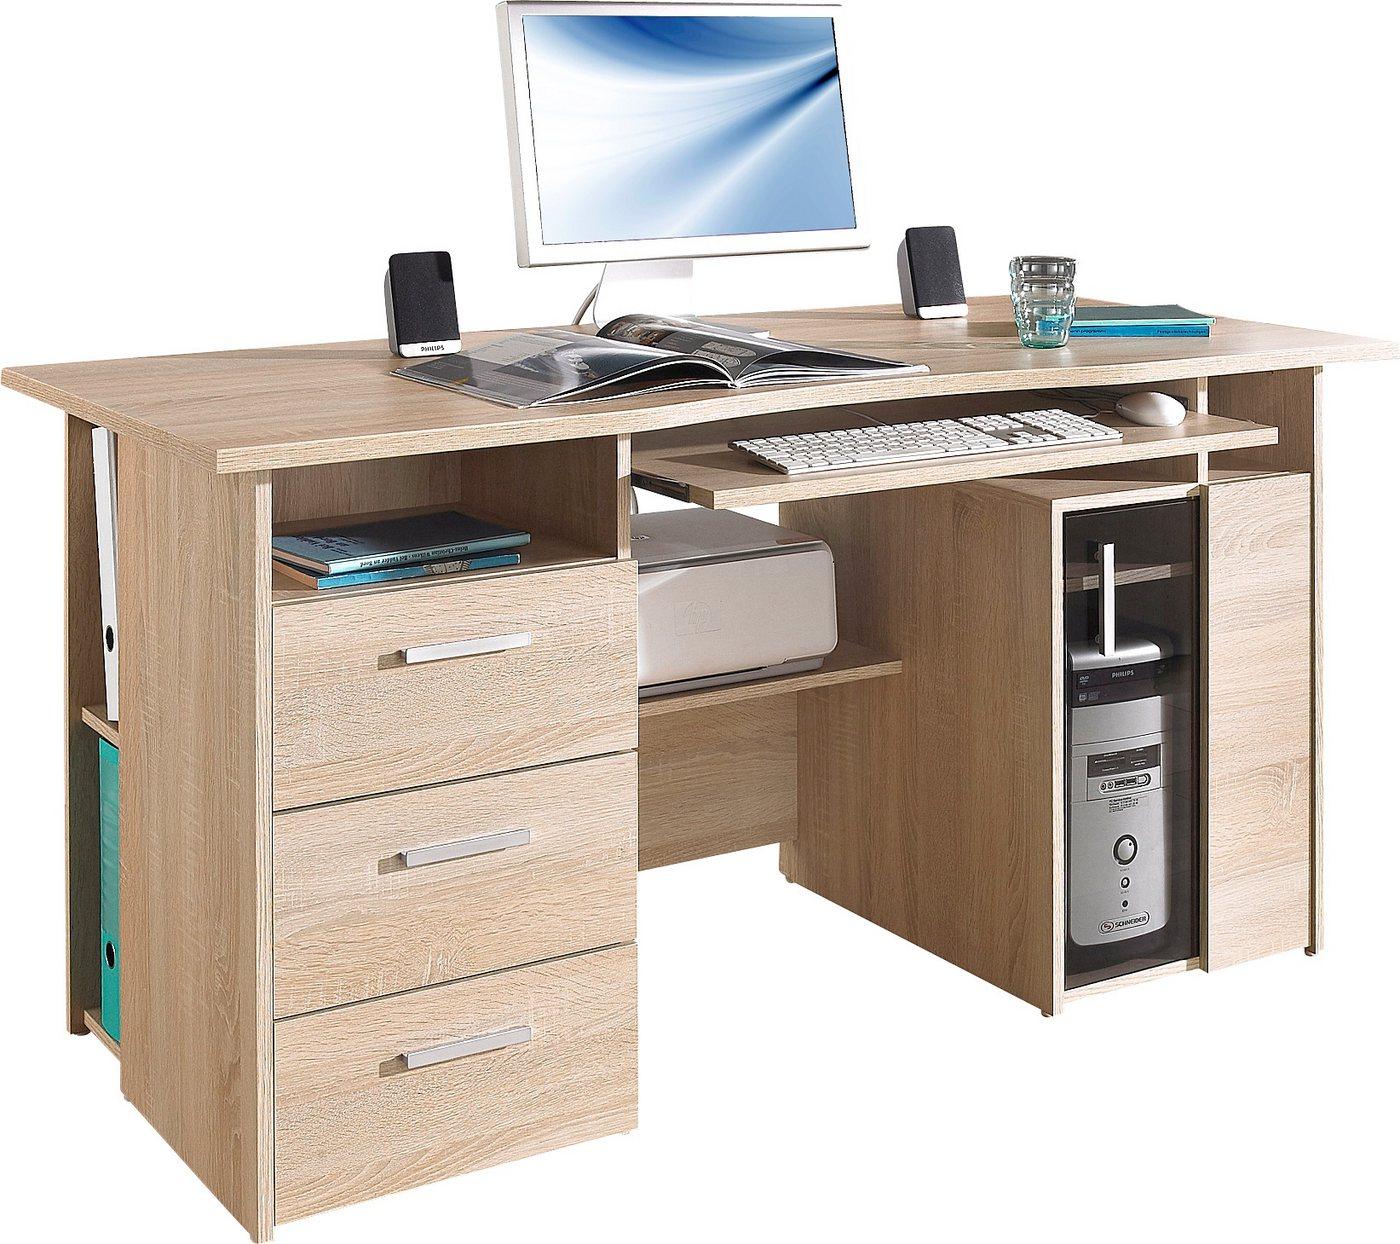 MAJA Computerbureau Heide